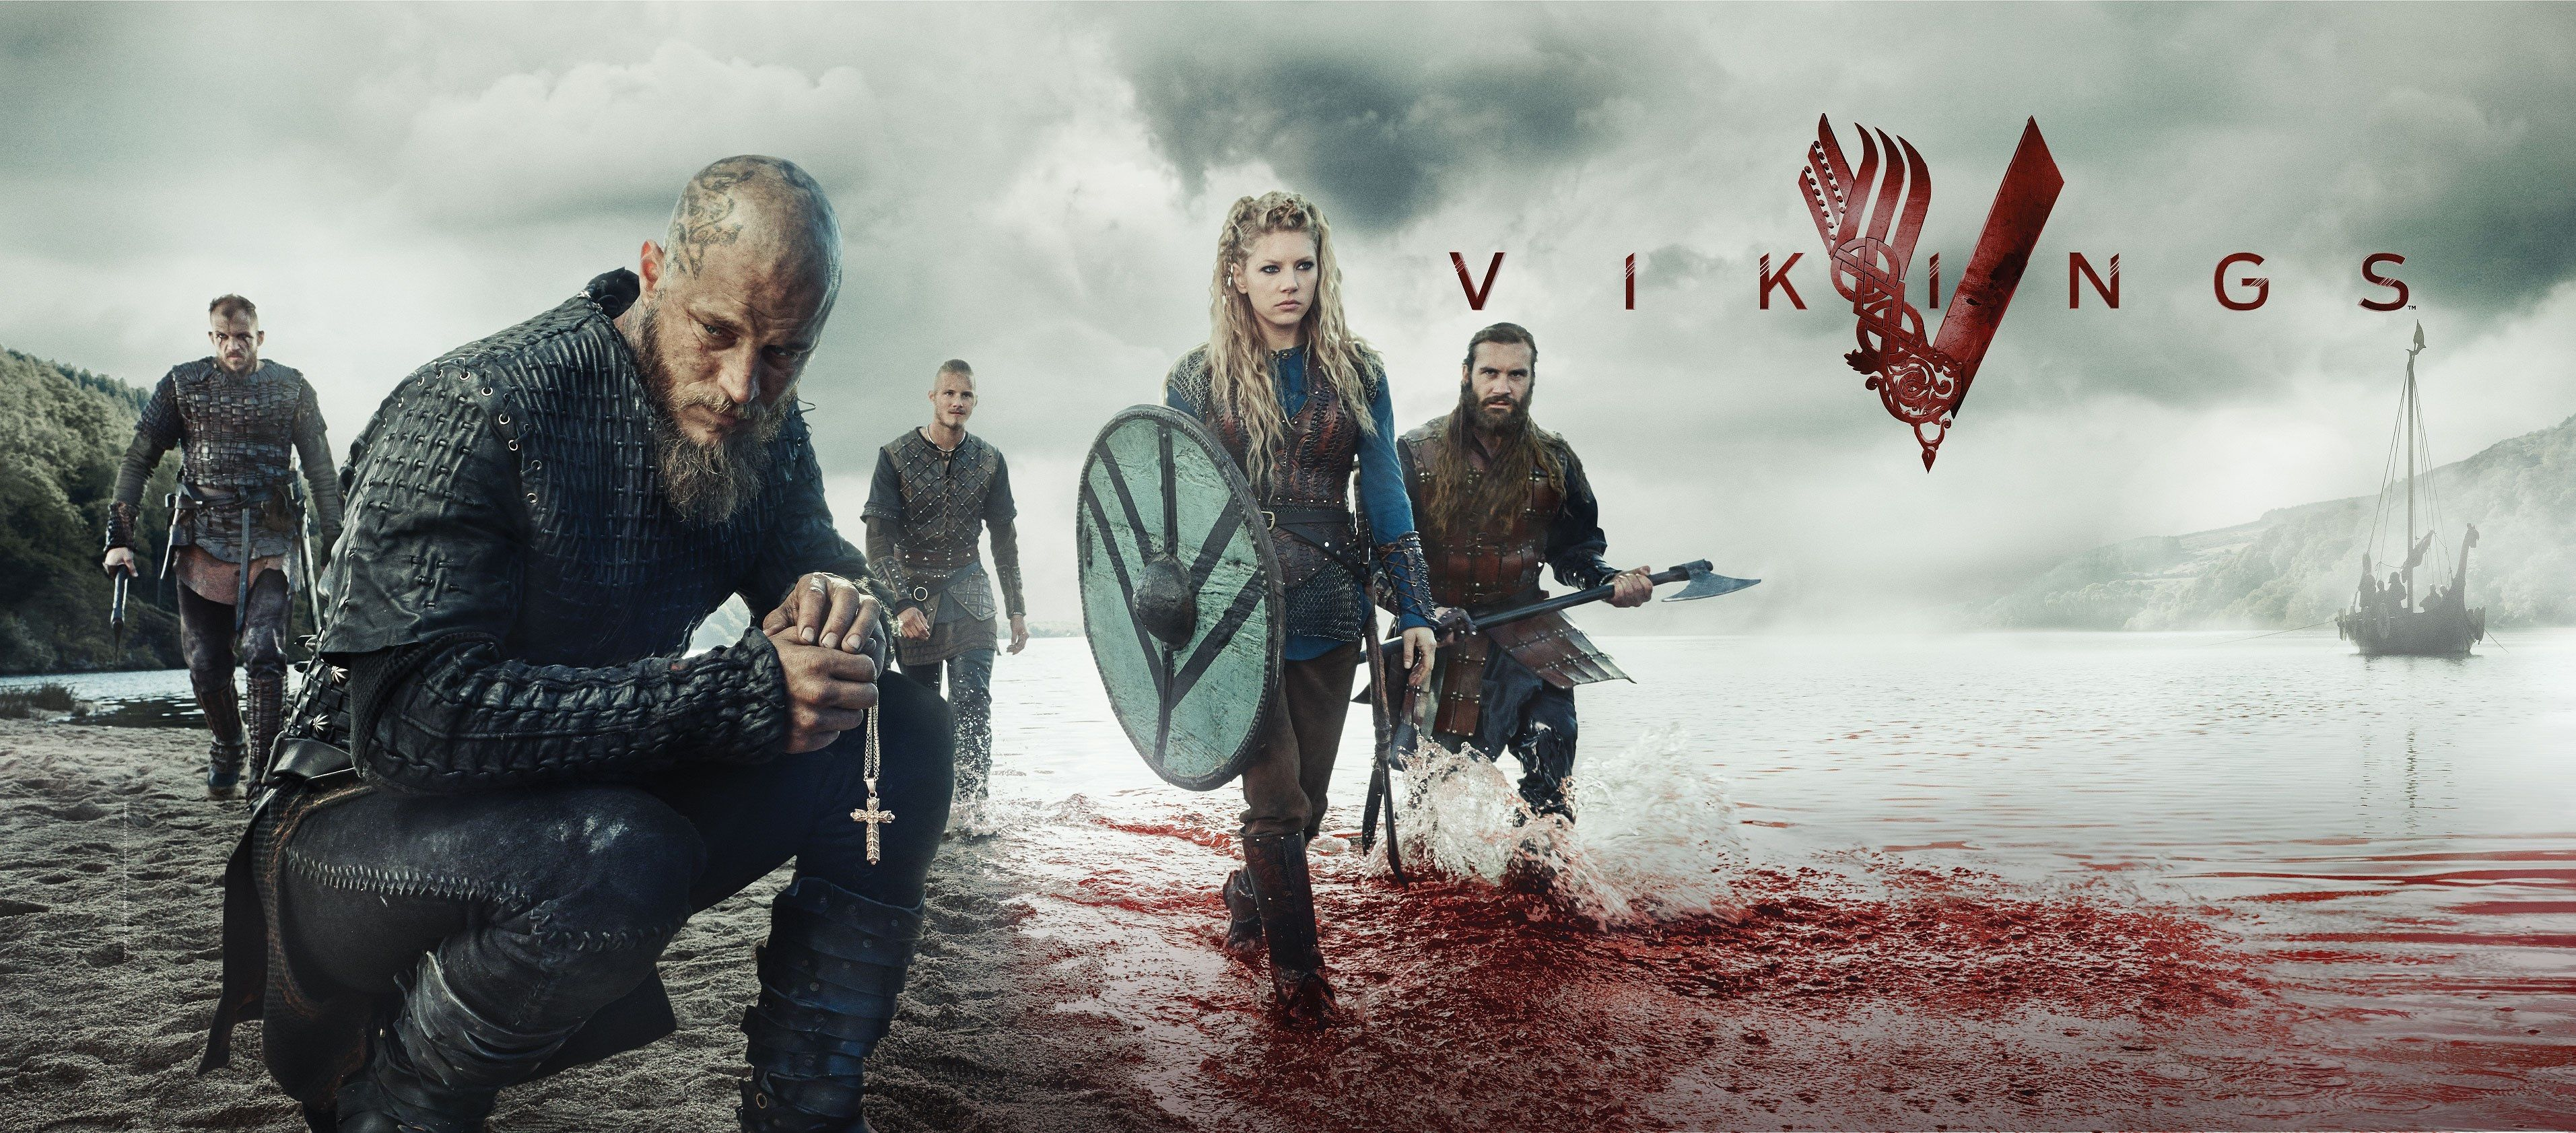 3826x1683 Vikings 4k Most Popular Wallpaper For Desktop Vikings Season Vikings Tv Show Vikings Tv